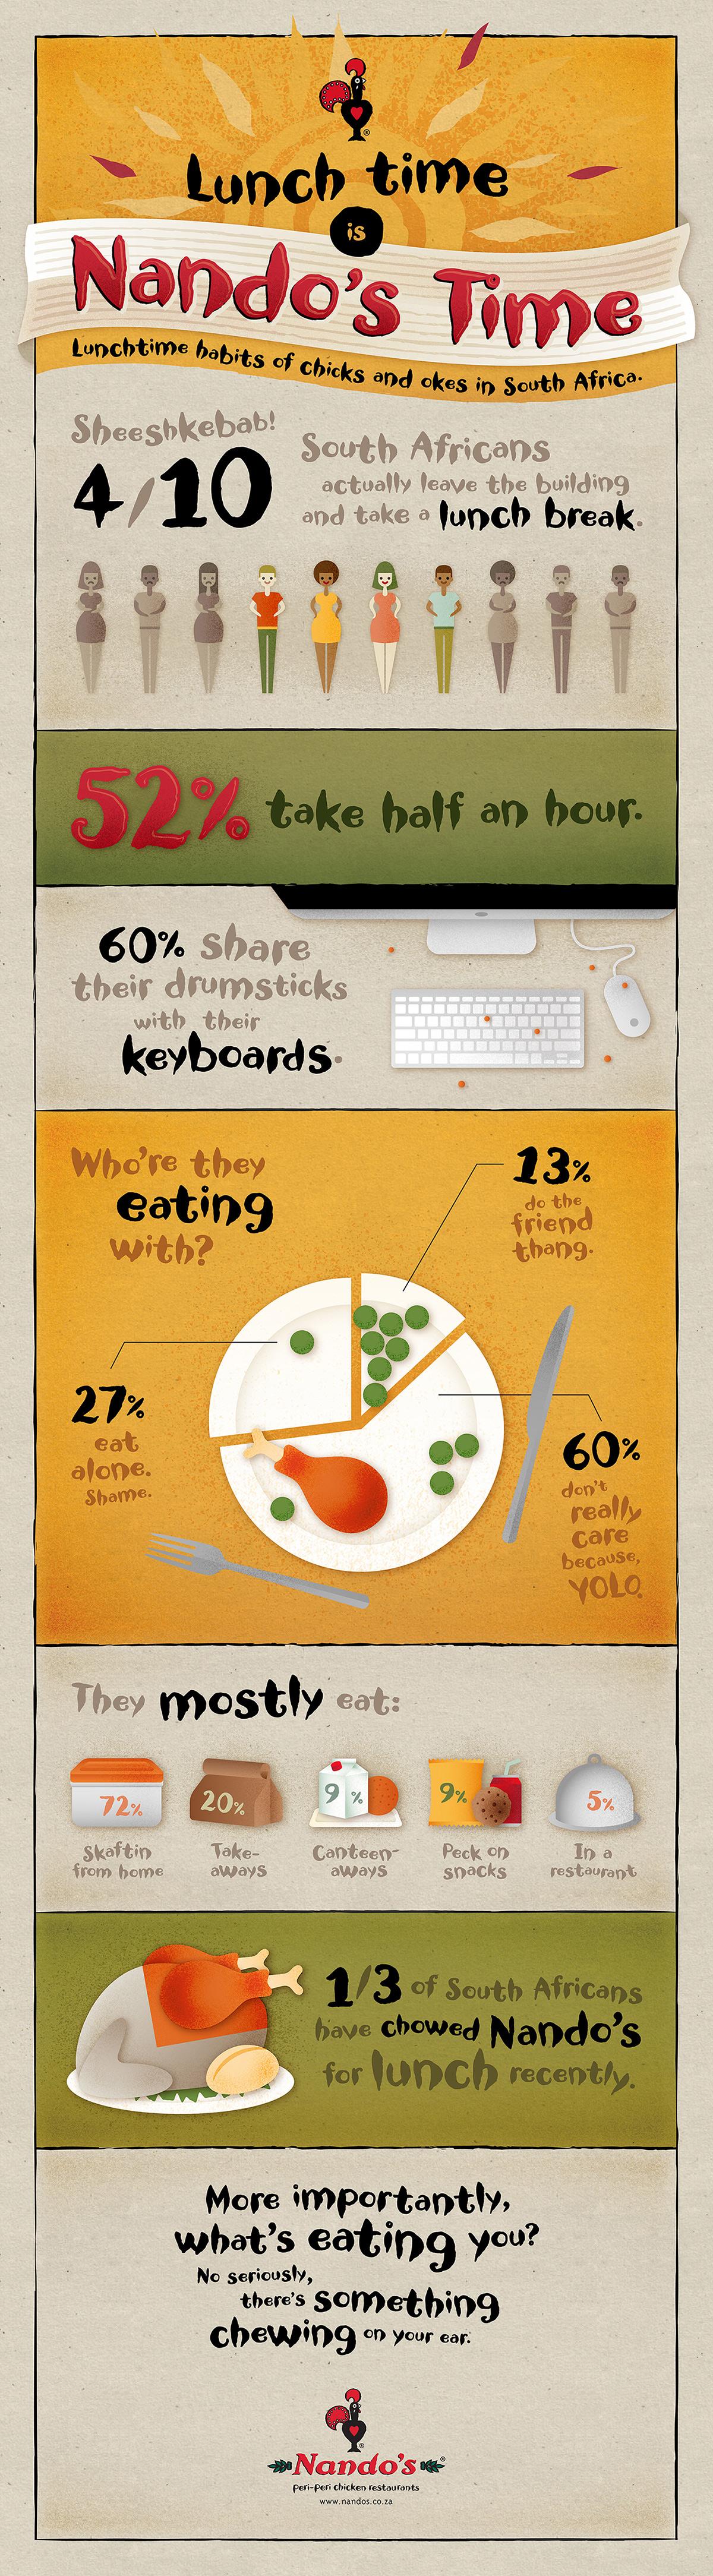 LG_Portfolio 2014_Work_Nandos Infographic_01